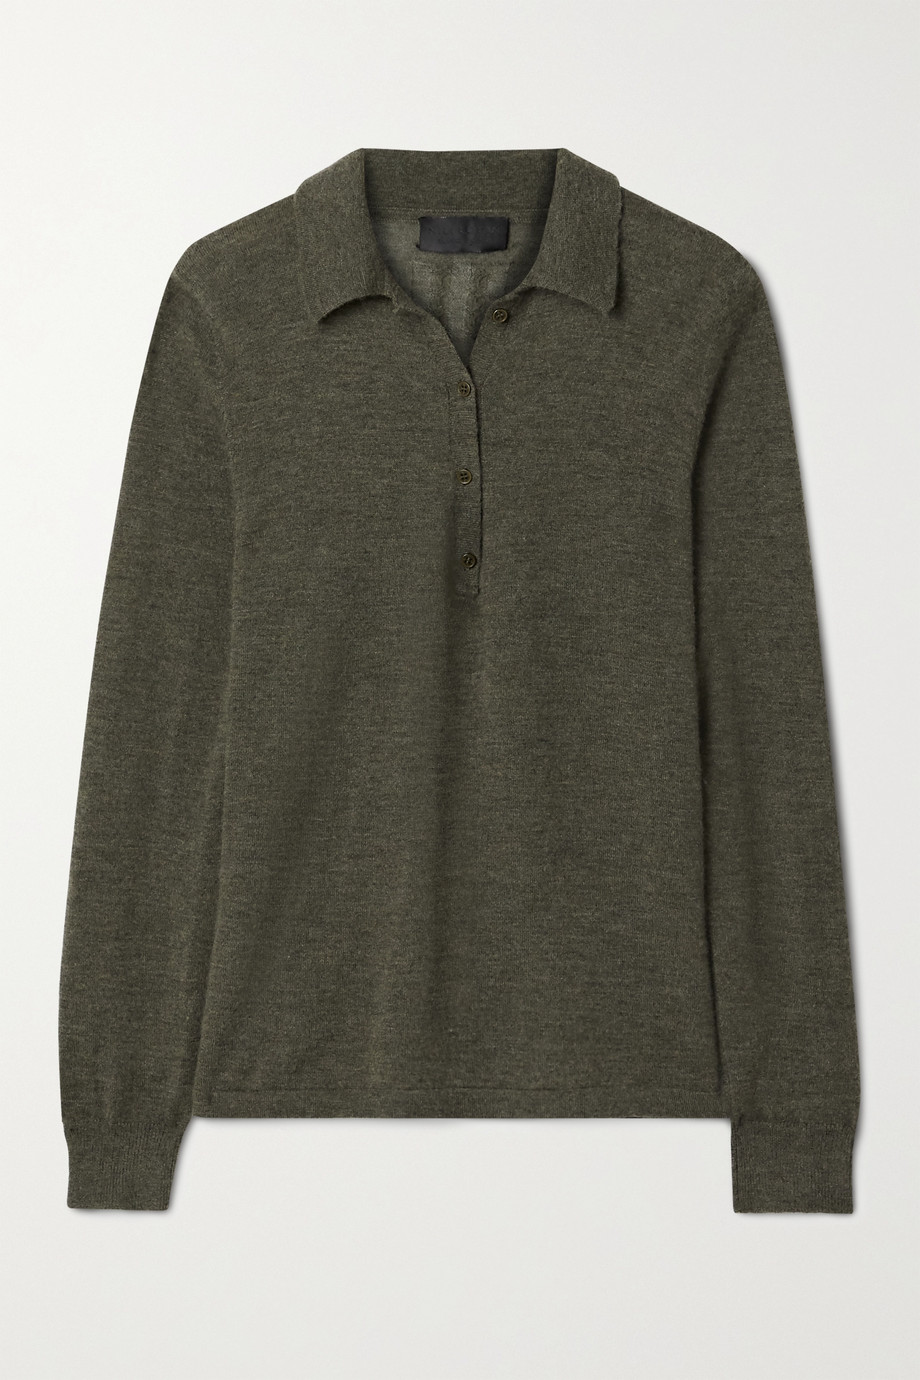 Nili Lotan Cashmere sweater